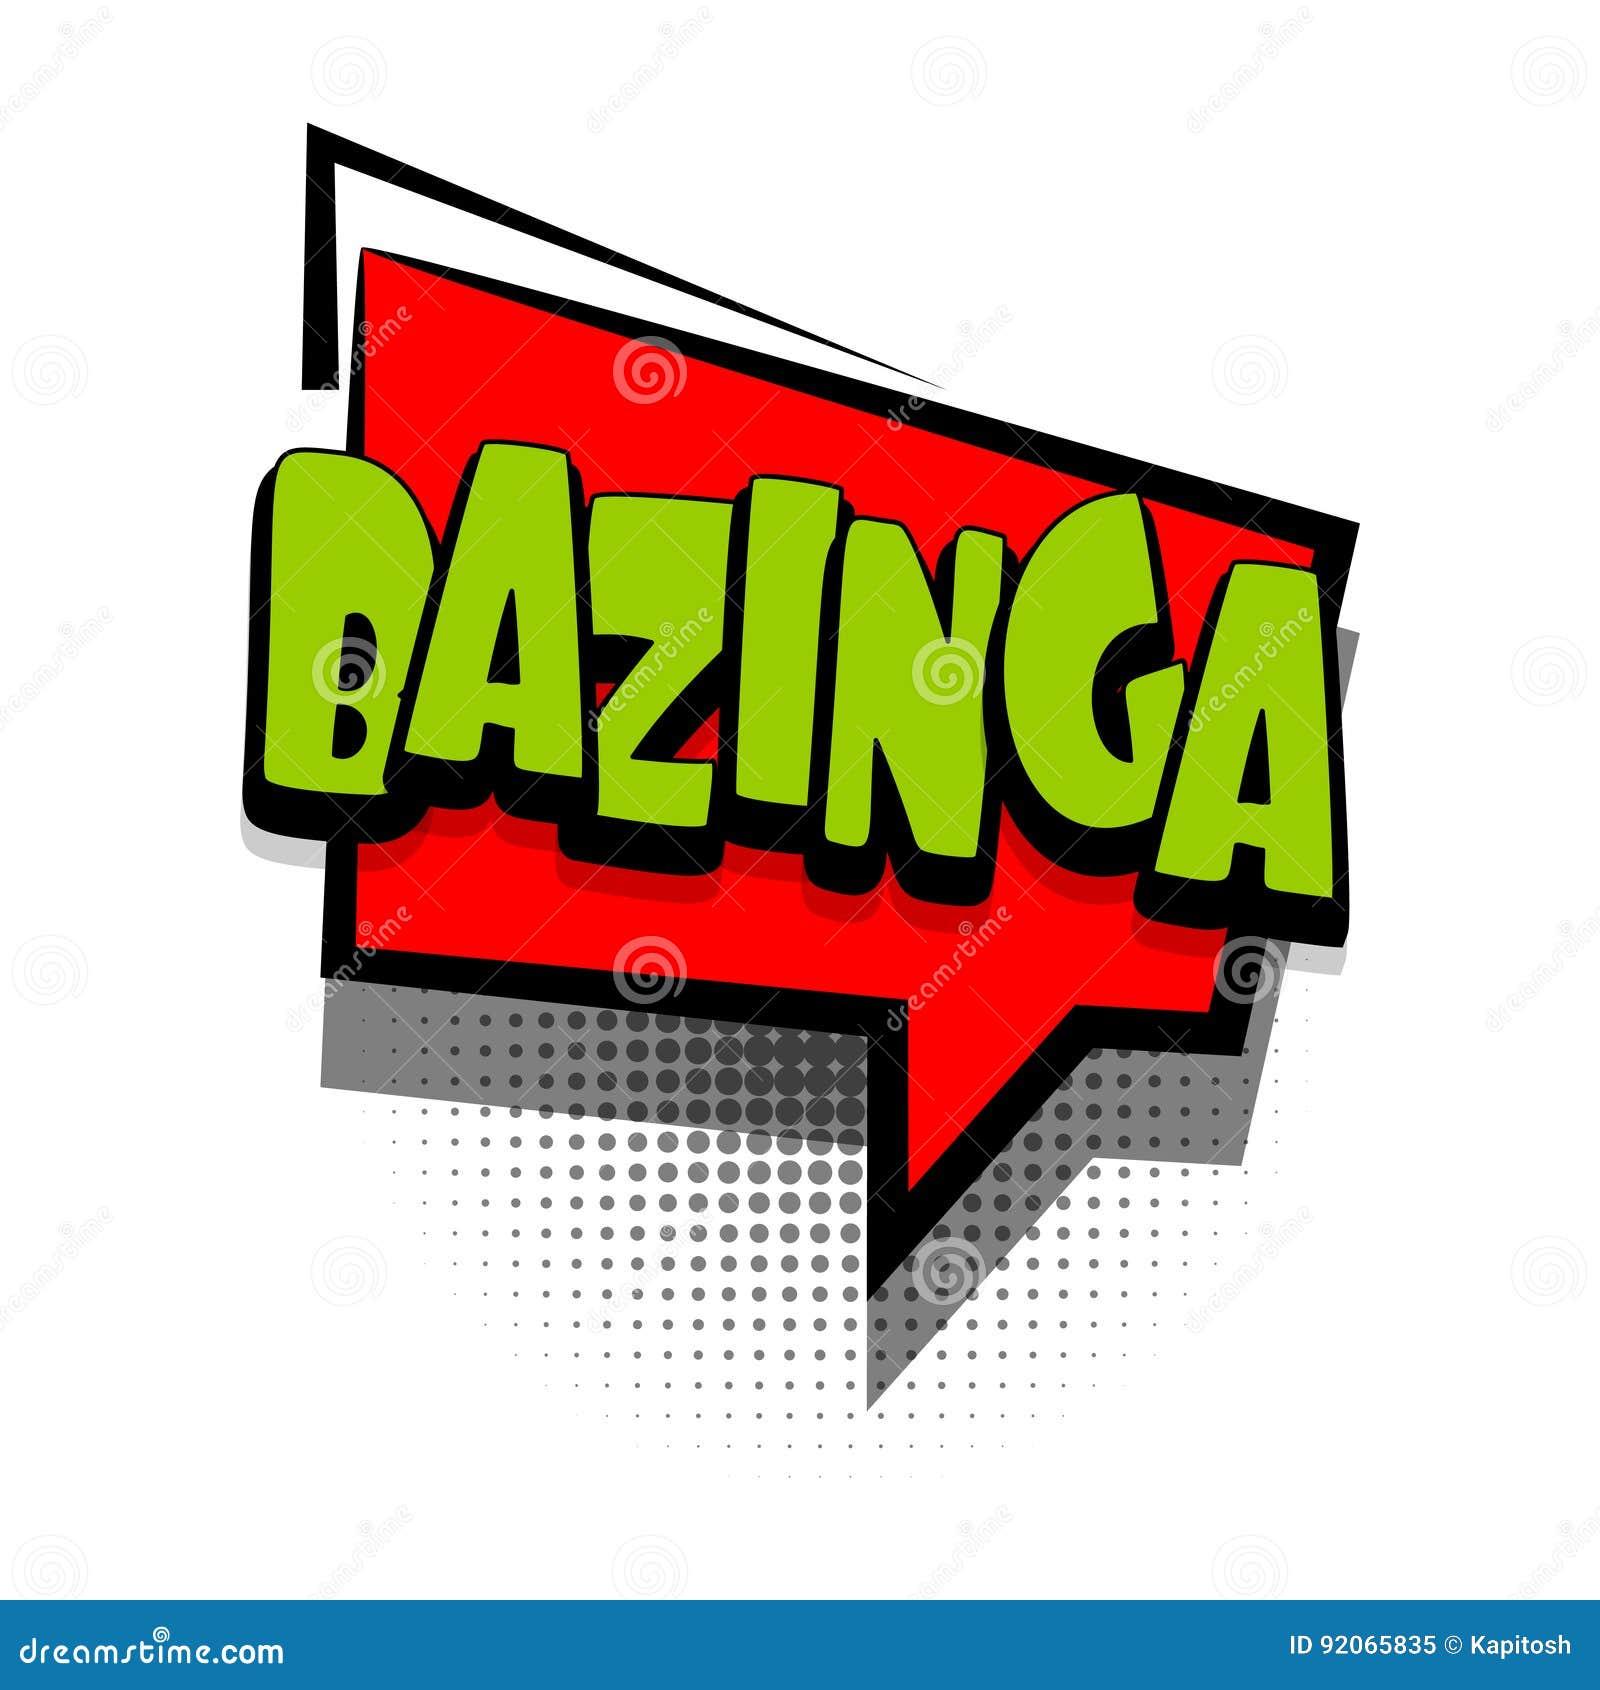 Bubble bazinga free version android free download bubble bazinga.